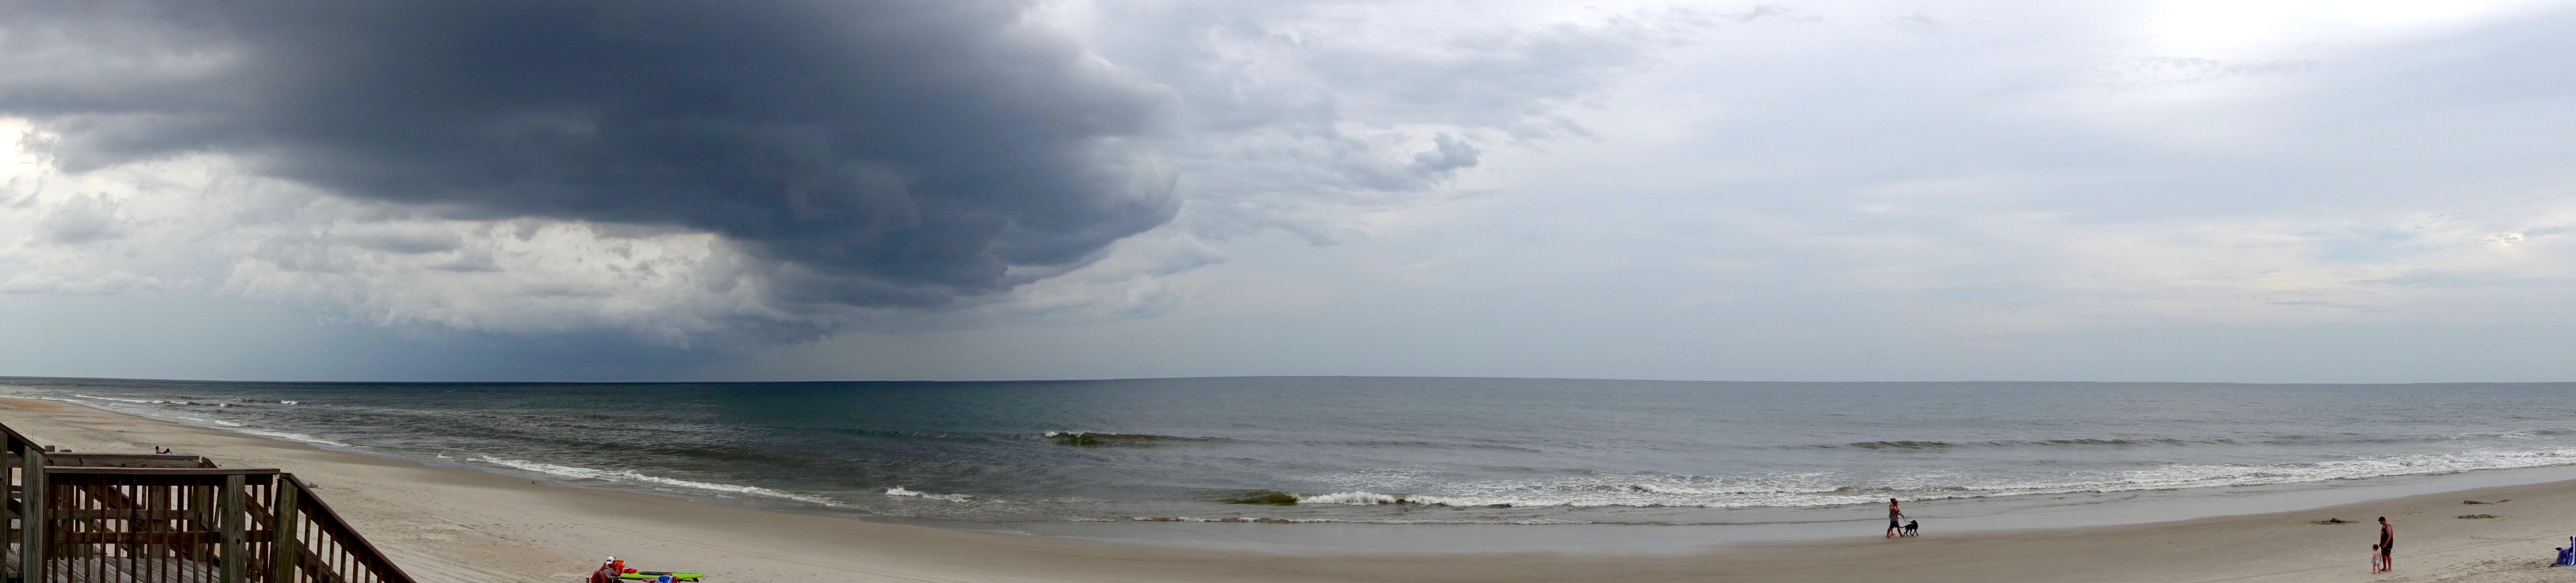 Free stock photo of beach, clouds, ocean, panorama